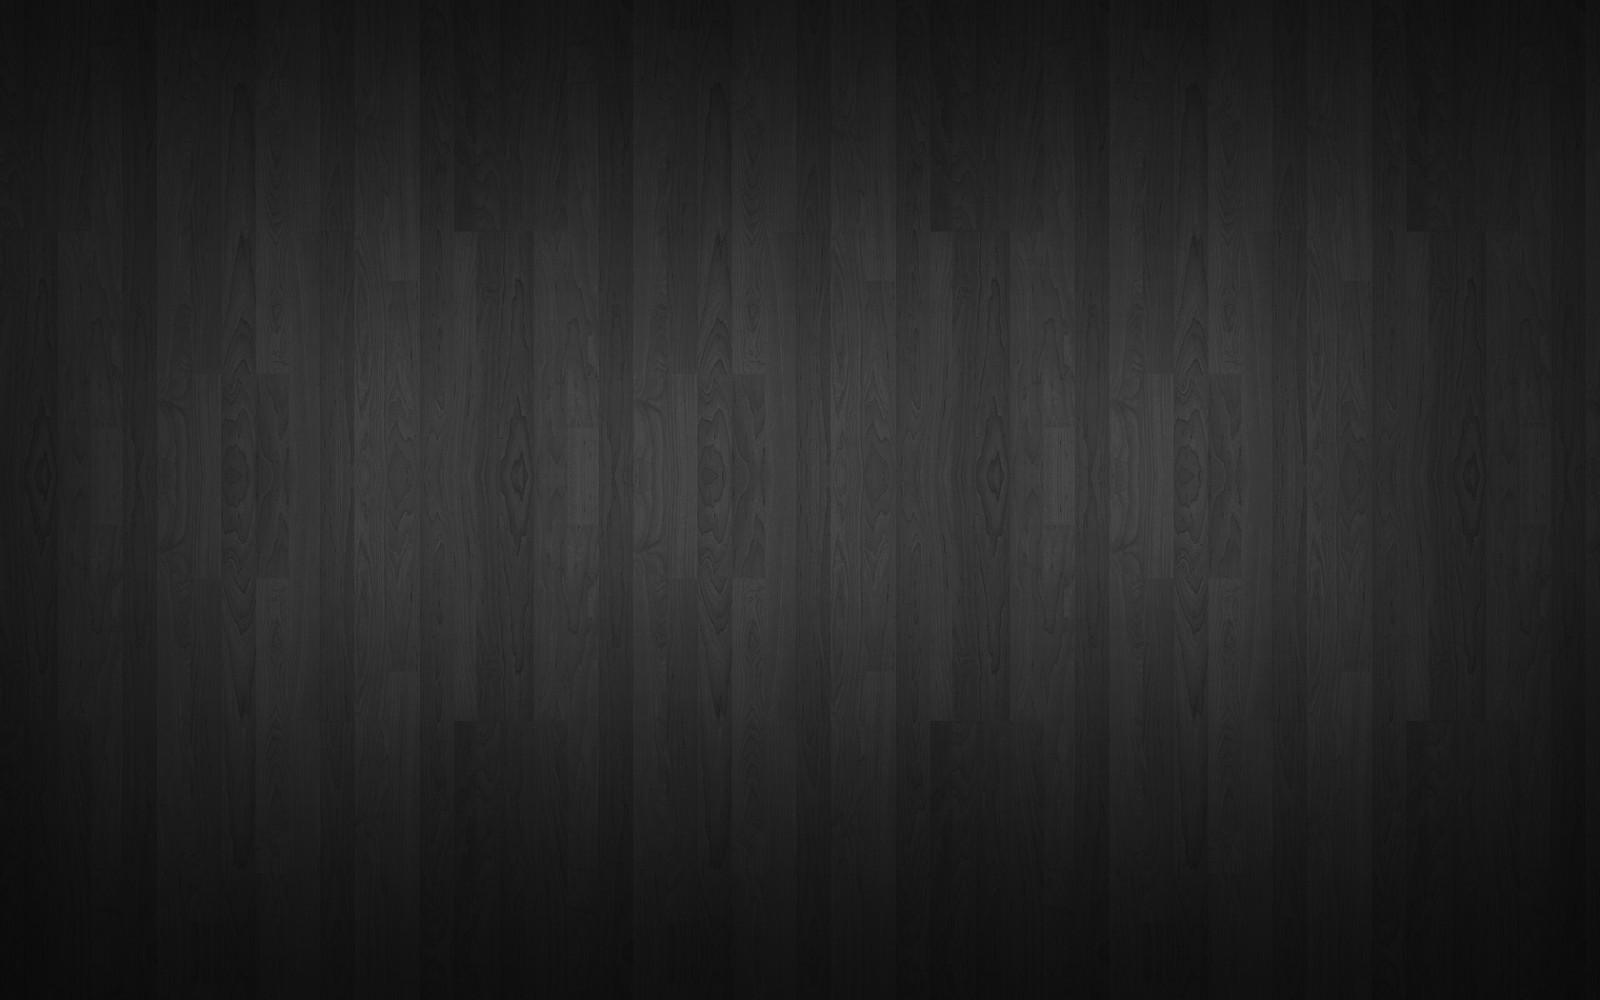 Wallpaper Satu Warna Latar Belakang Yang Sederhana Kayu Teks Tekstur Lingkaran Bertekstur Kelabu Bentuk Garis Kegelapan Screenshot Wallpaper Komputer Hitam Dan Putih Fotografi Monokrom Fon 1680x1050 Paranoiddollv2 261837 Hd